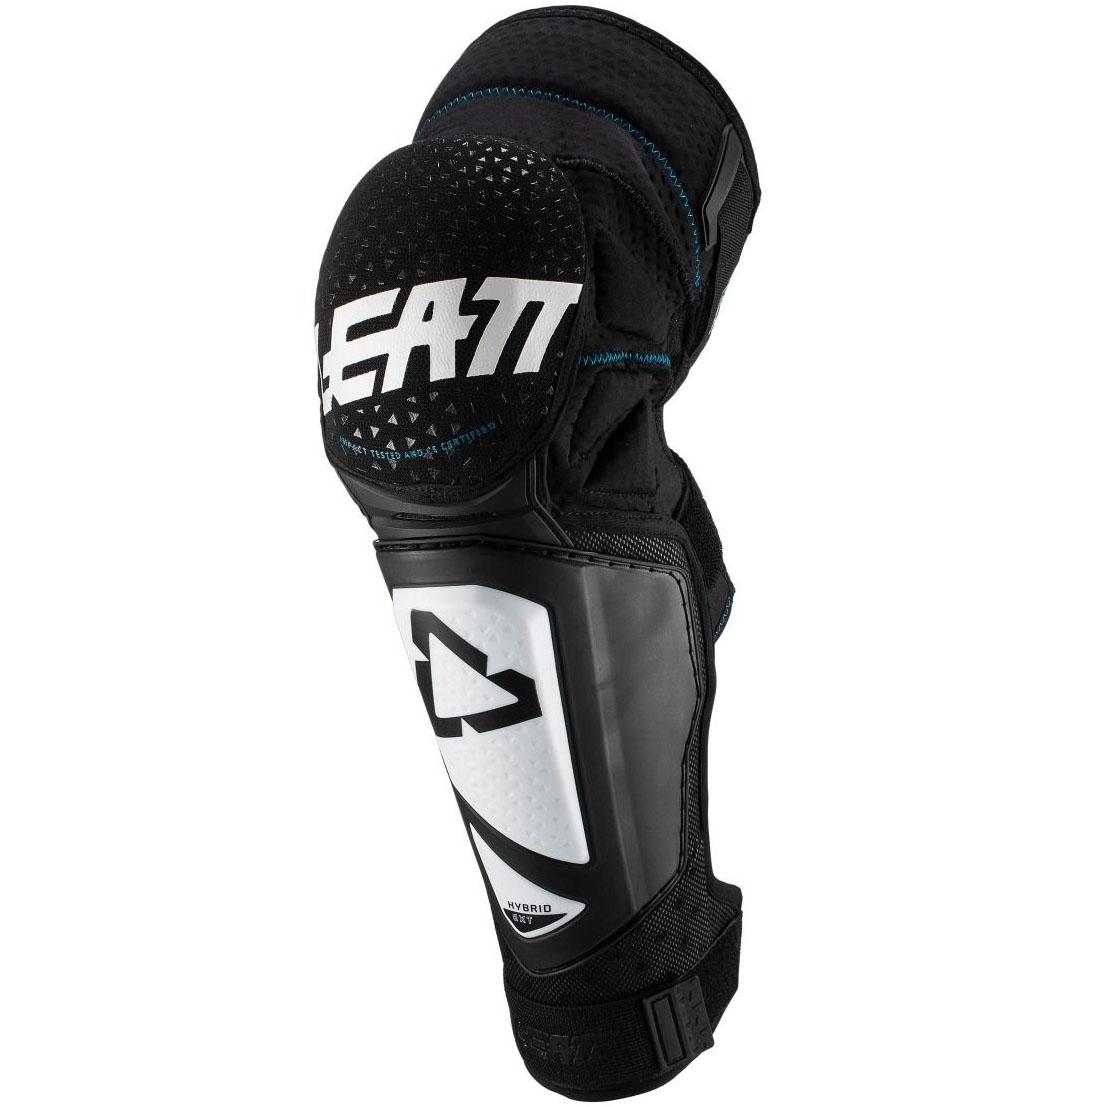 Leatt - 2019 3DF Hybrid EXT Knee & Shin Guard Black/White защита колен, черно-белая